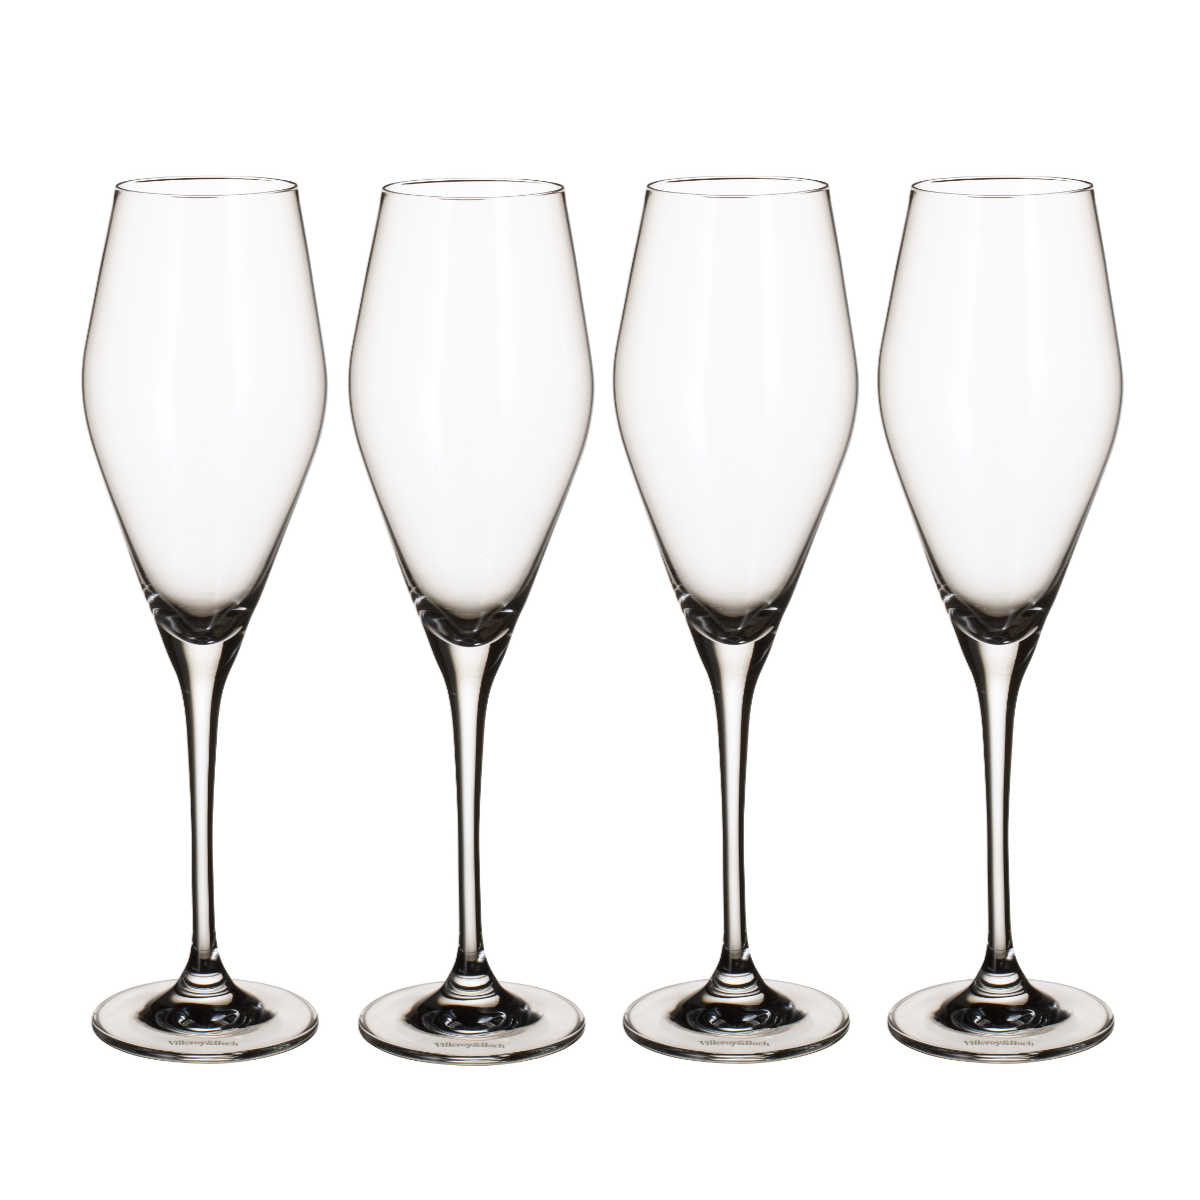 La Divina Champagne Flute Set of 4 260ml